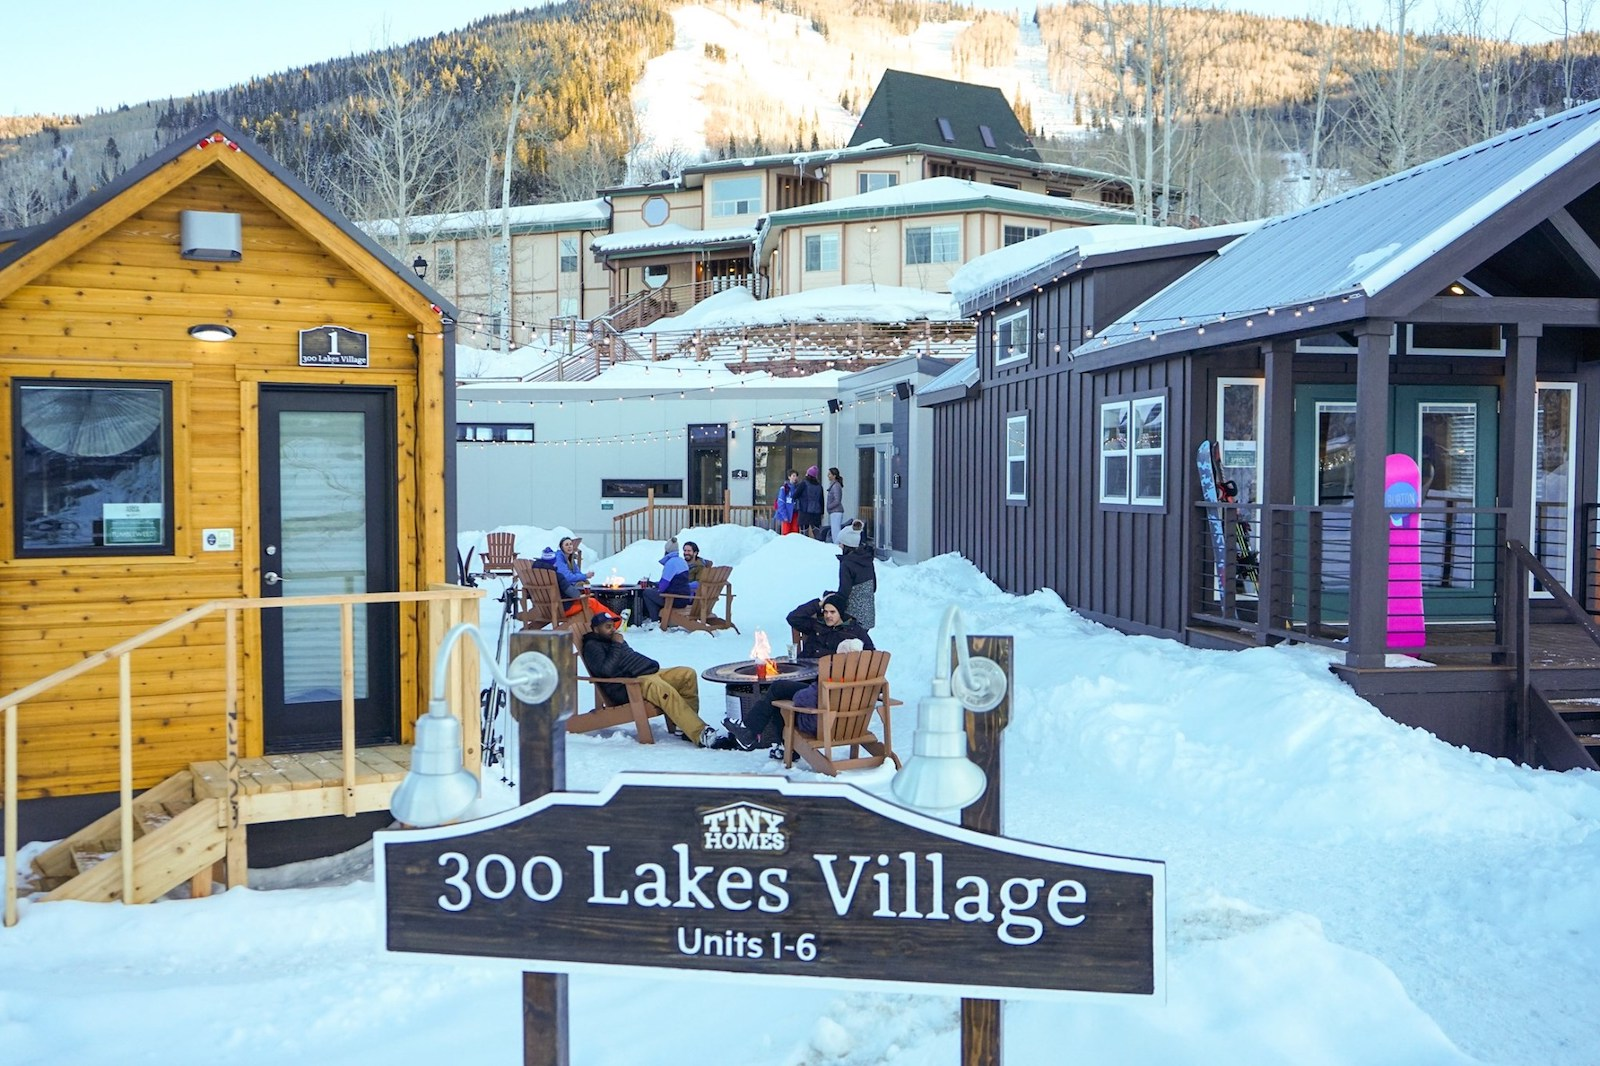 Image of 300 Lakes Village at the base camp of Powederhorn Resort